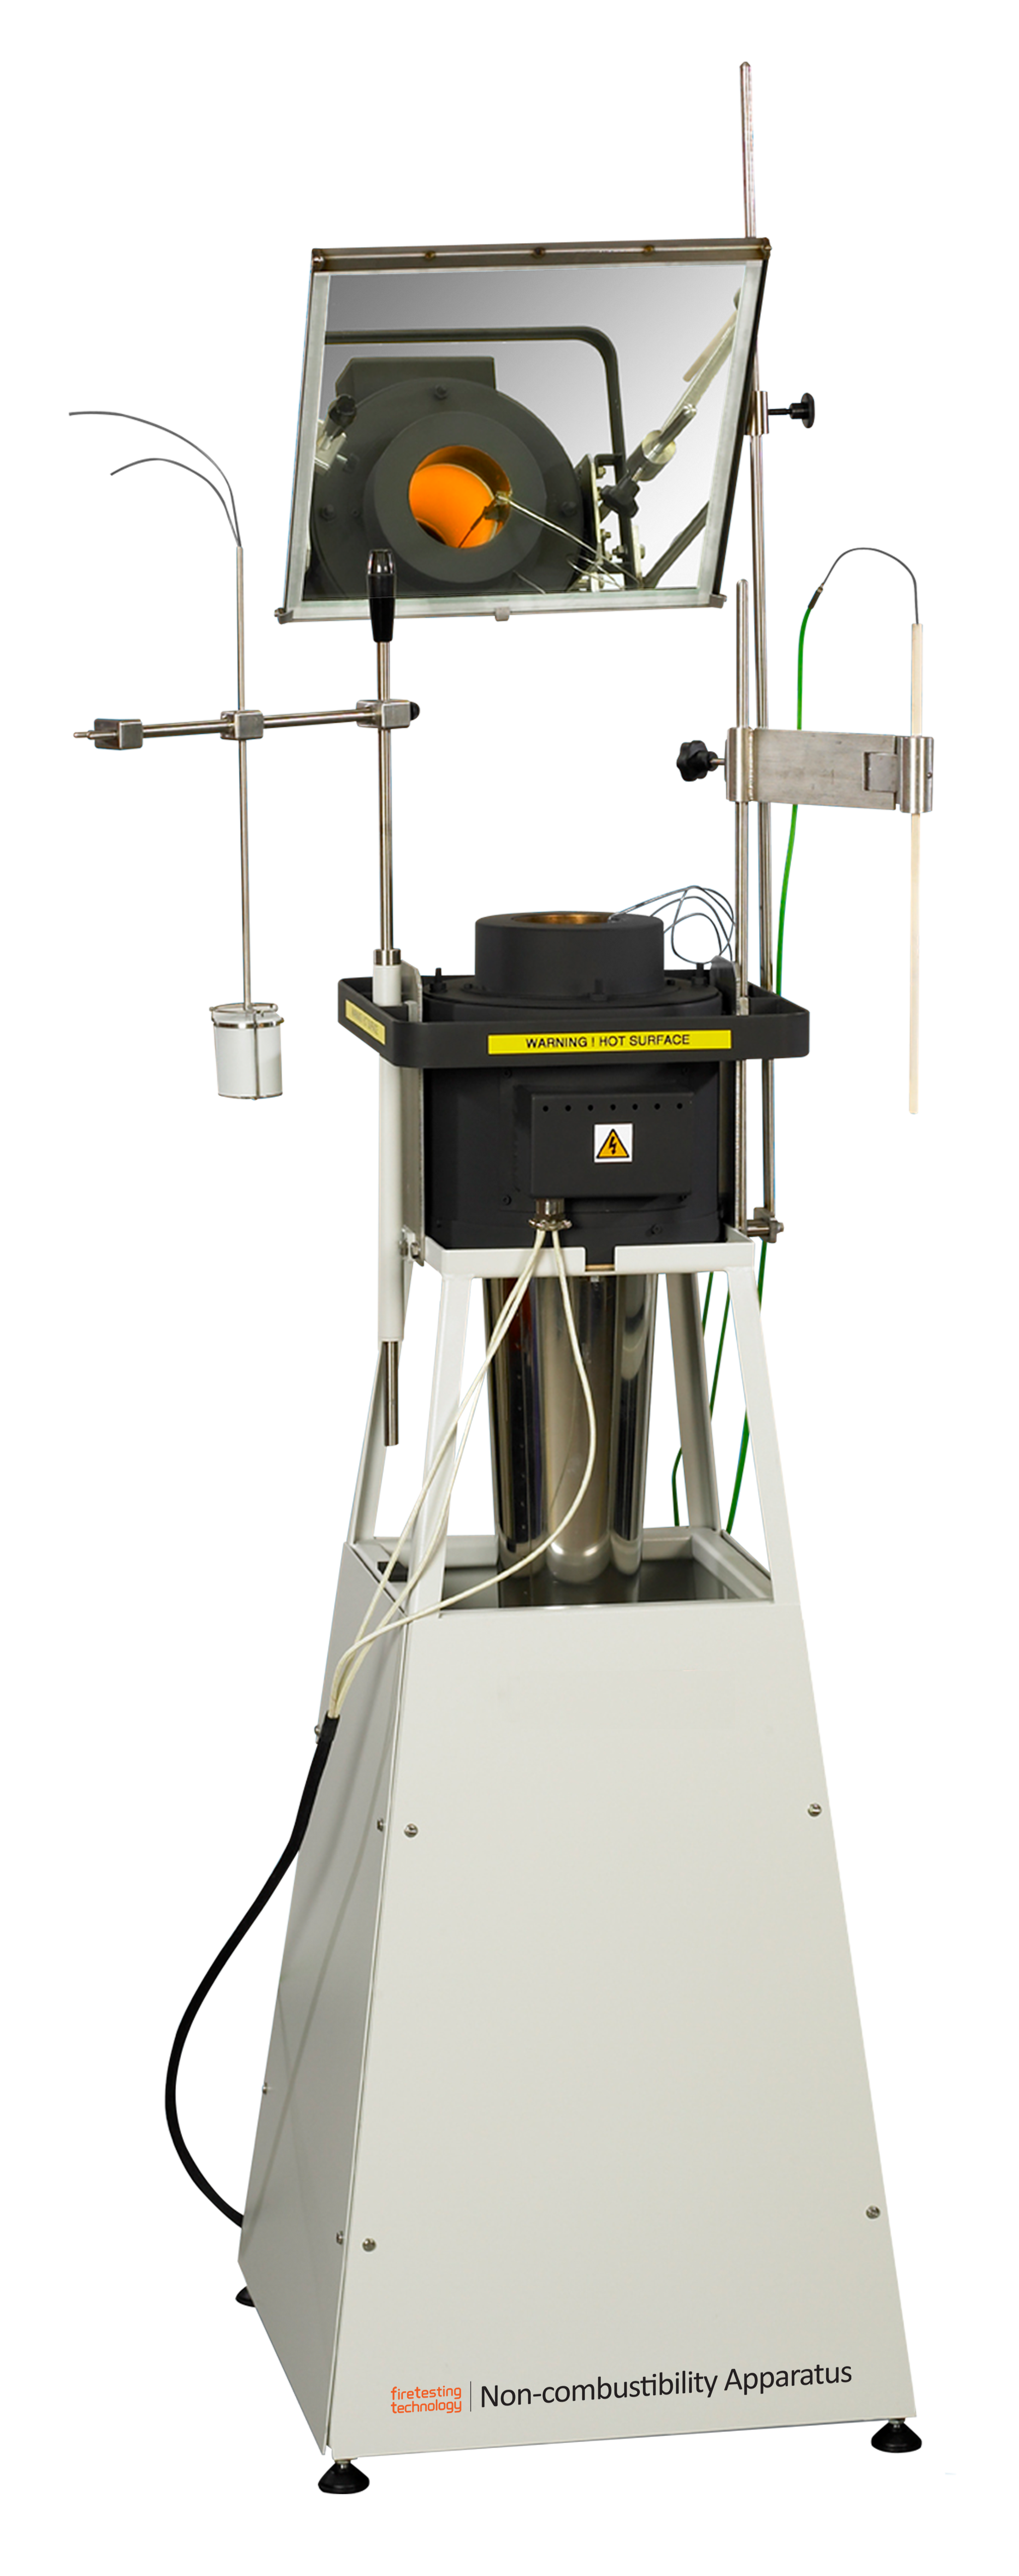 ISO 1182 non combustibility apparatus